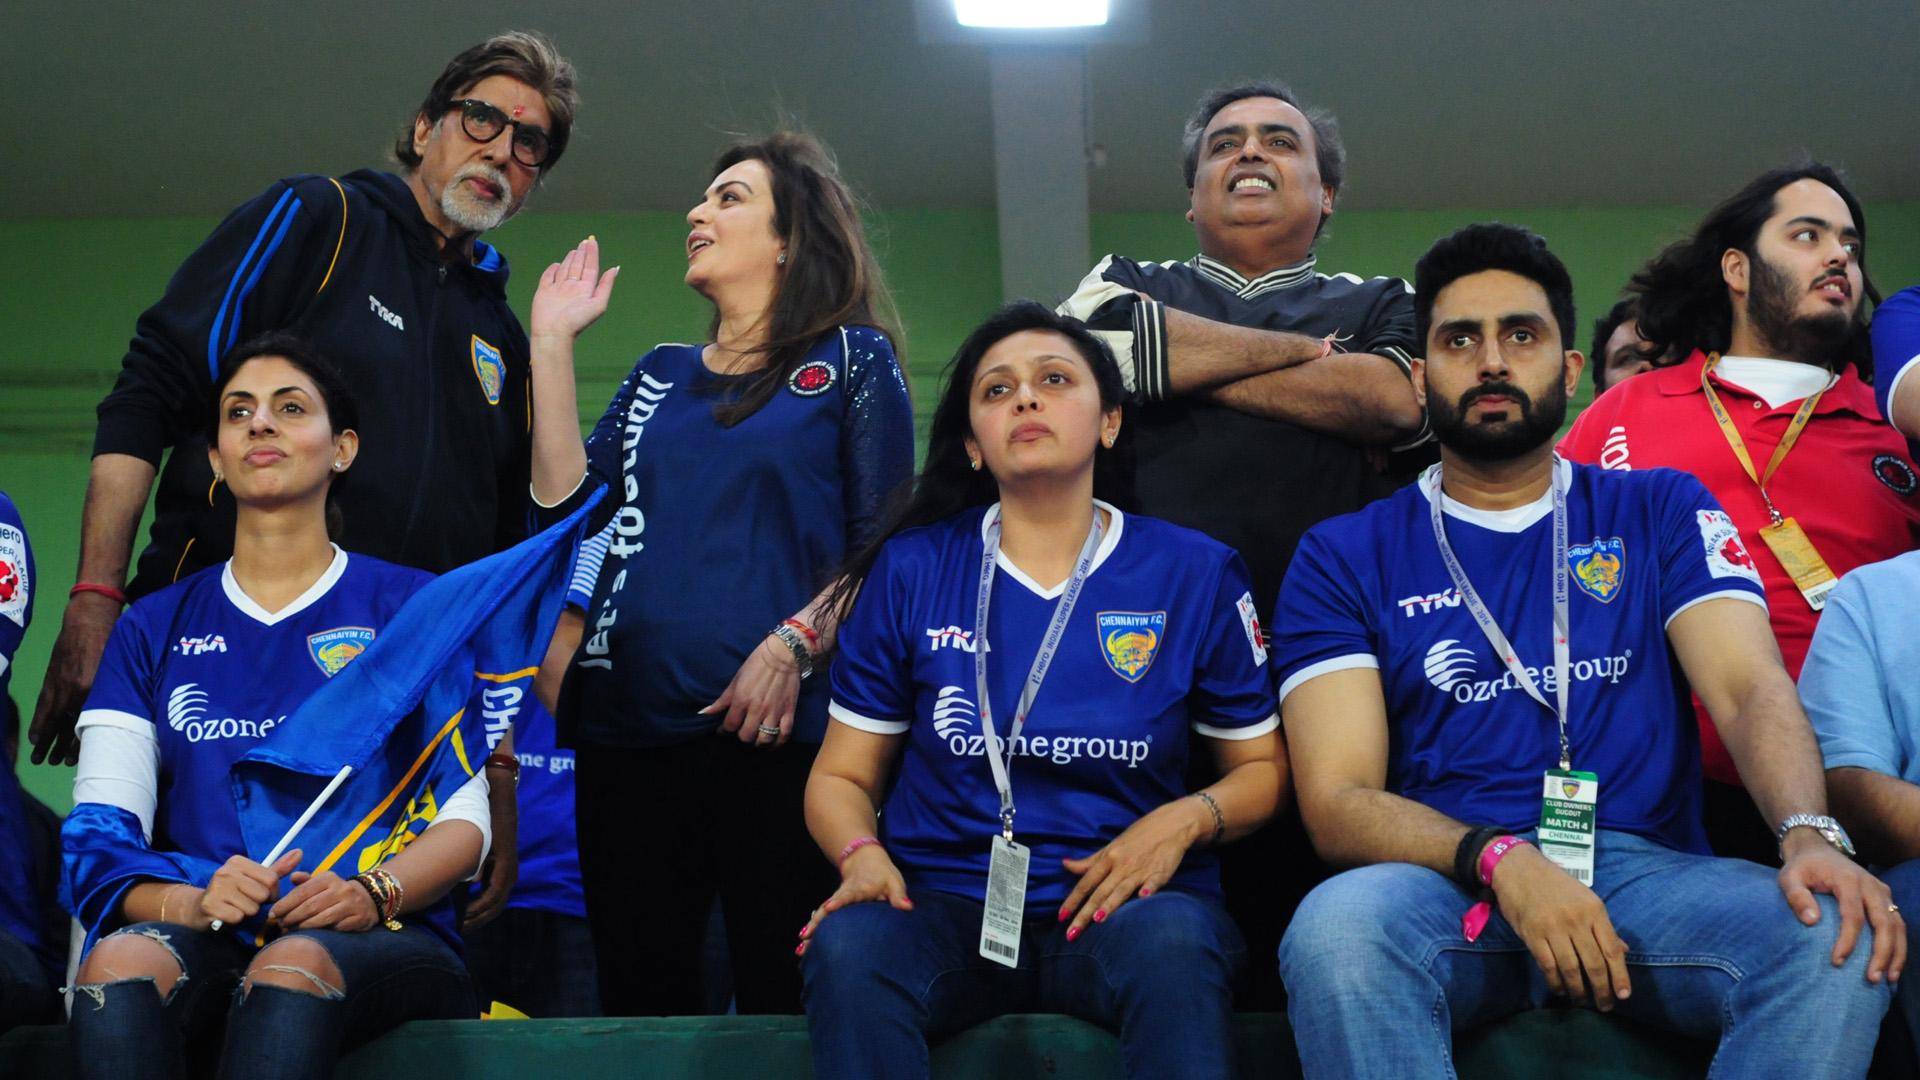 Amitabh Bachchan Nita Ambani Mukesh Ambani Abhishek Bachchan during Second ISL semi final match between Chennaiyin FC and Kerala Blasters FC